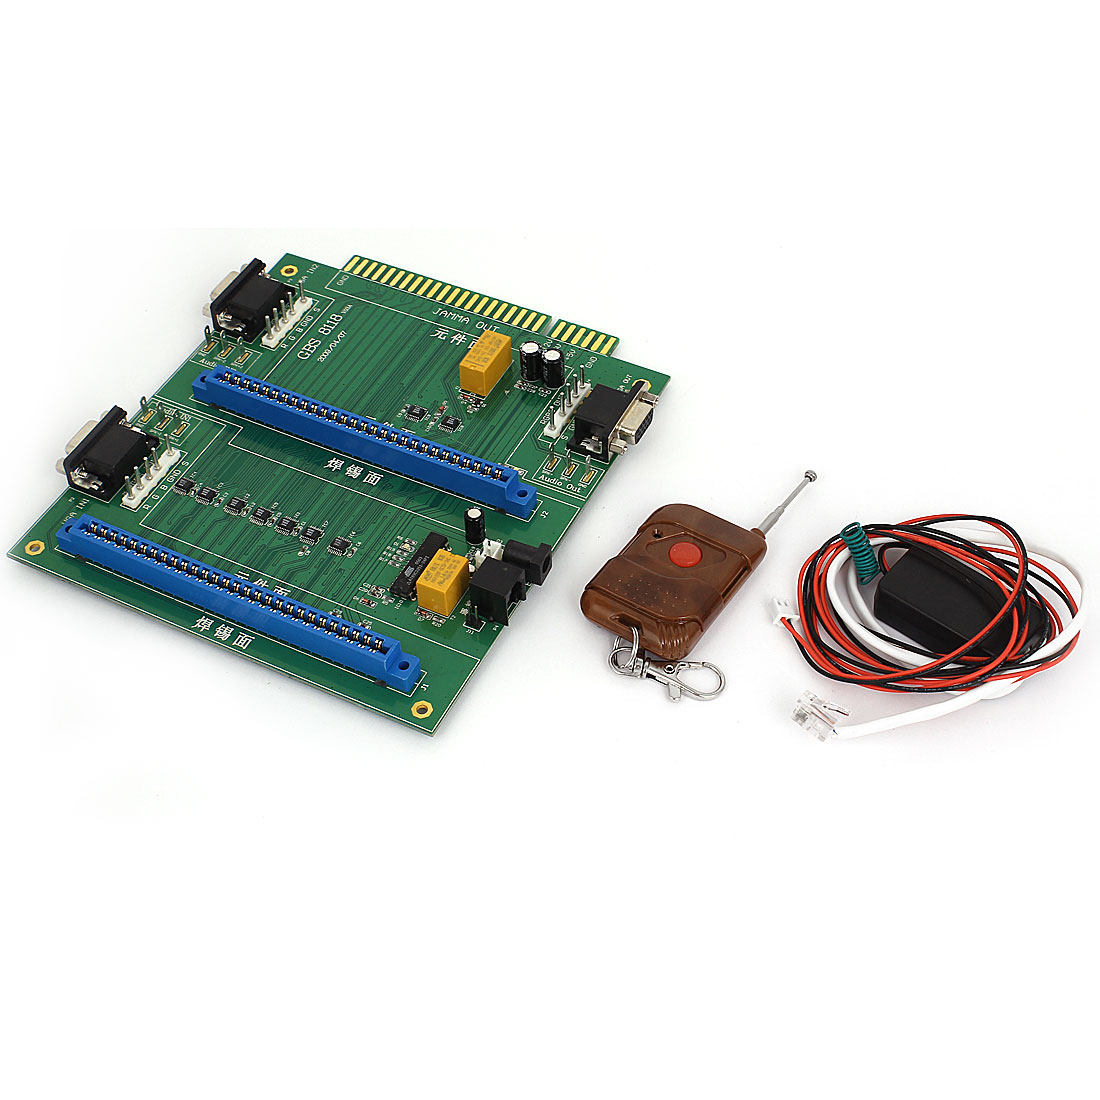 GBS-8118 Arcade Game 2in1 JAMMA Switcher PCB Remote Control